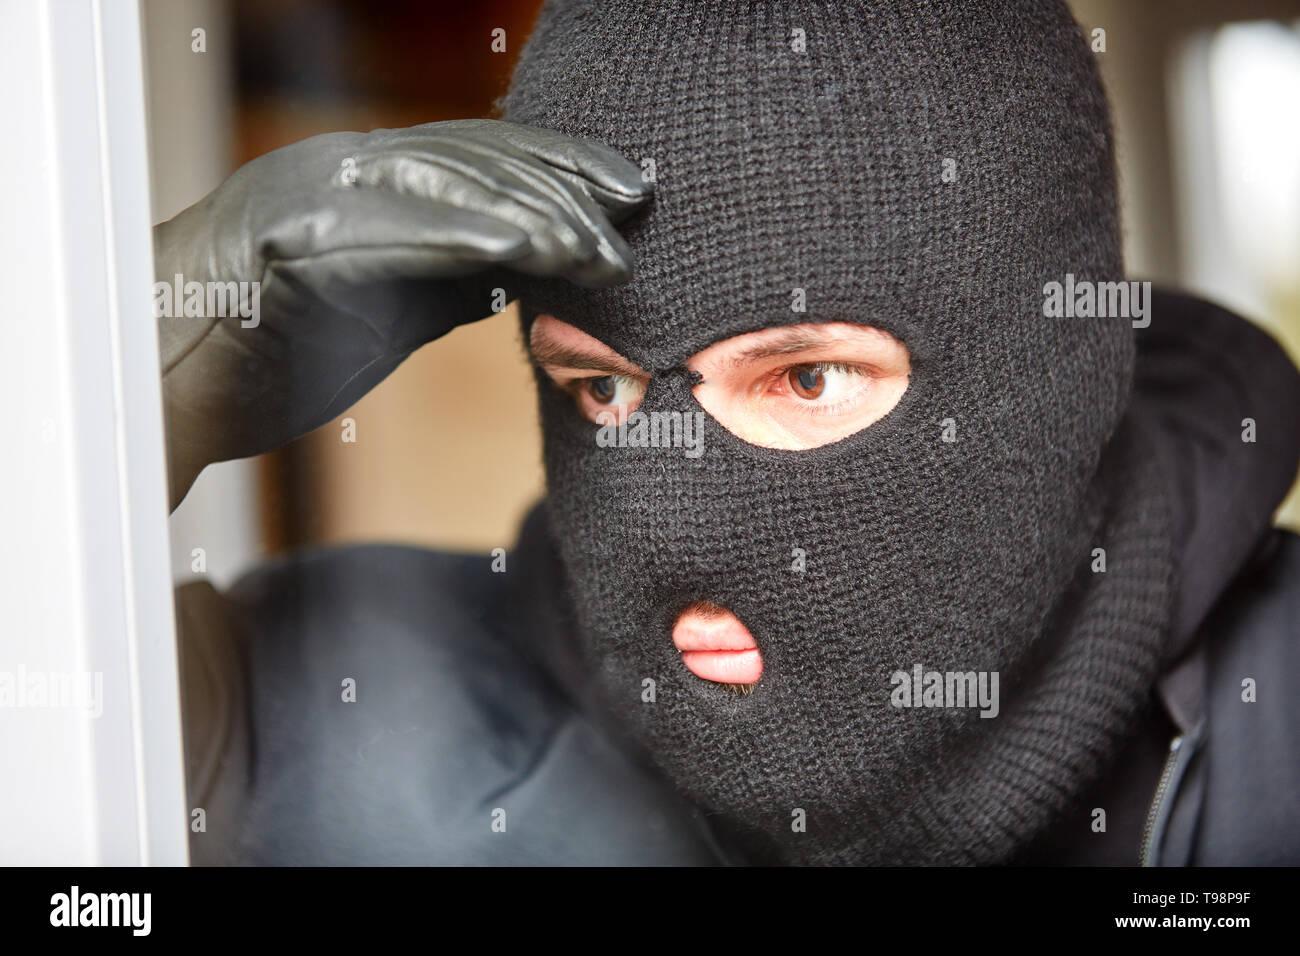 Masked burglar with balaclava peeks through window of a house before a burglary - Stock Image